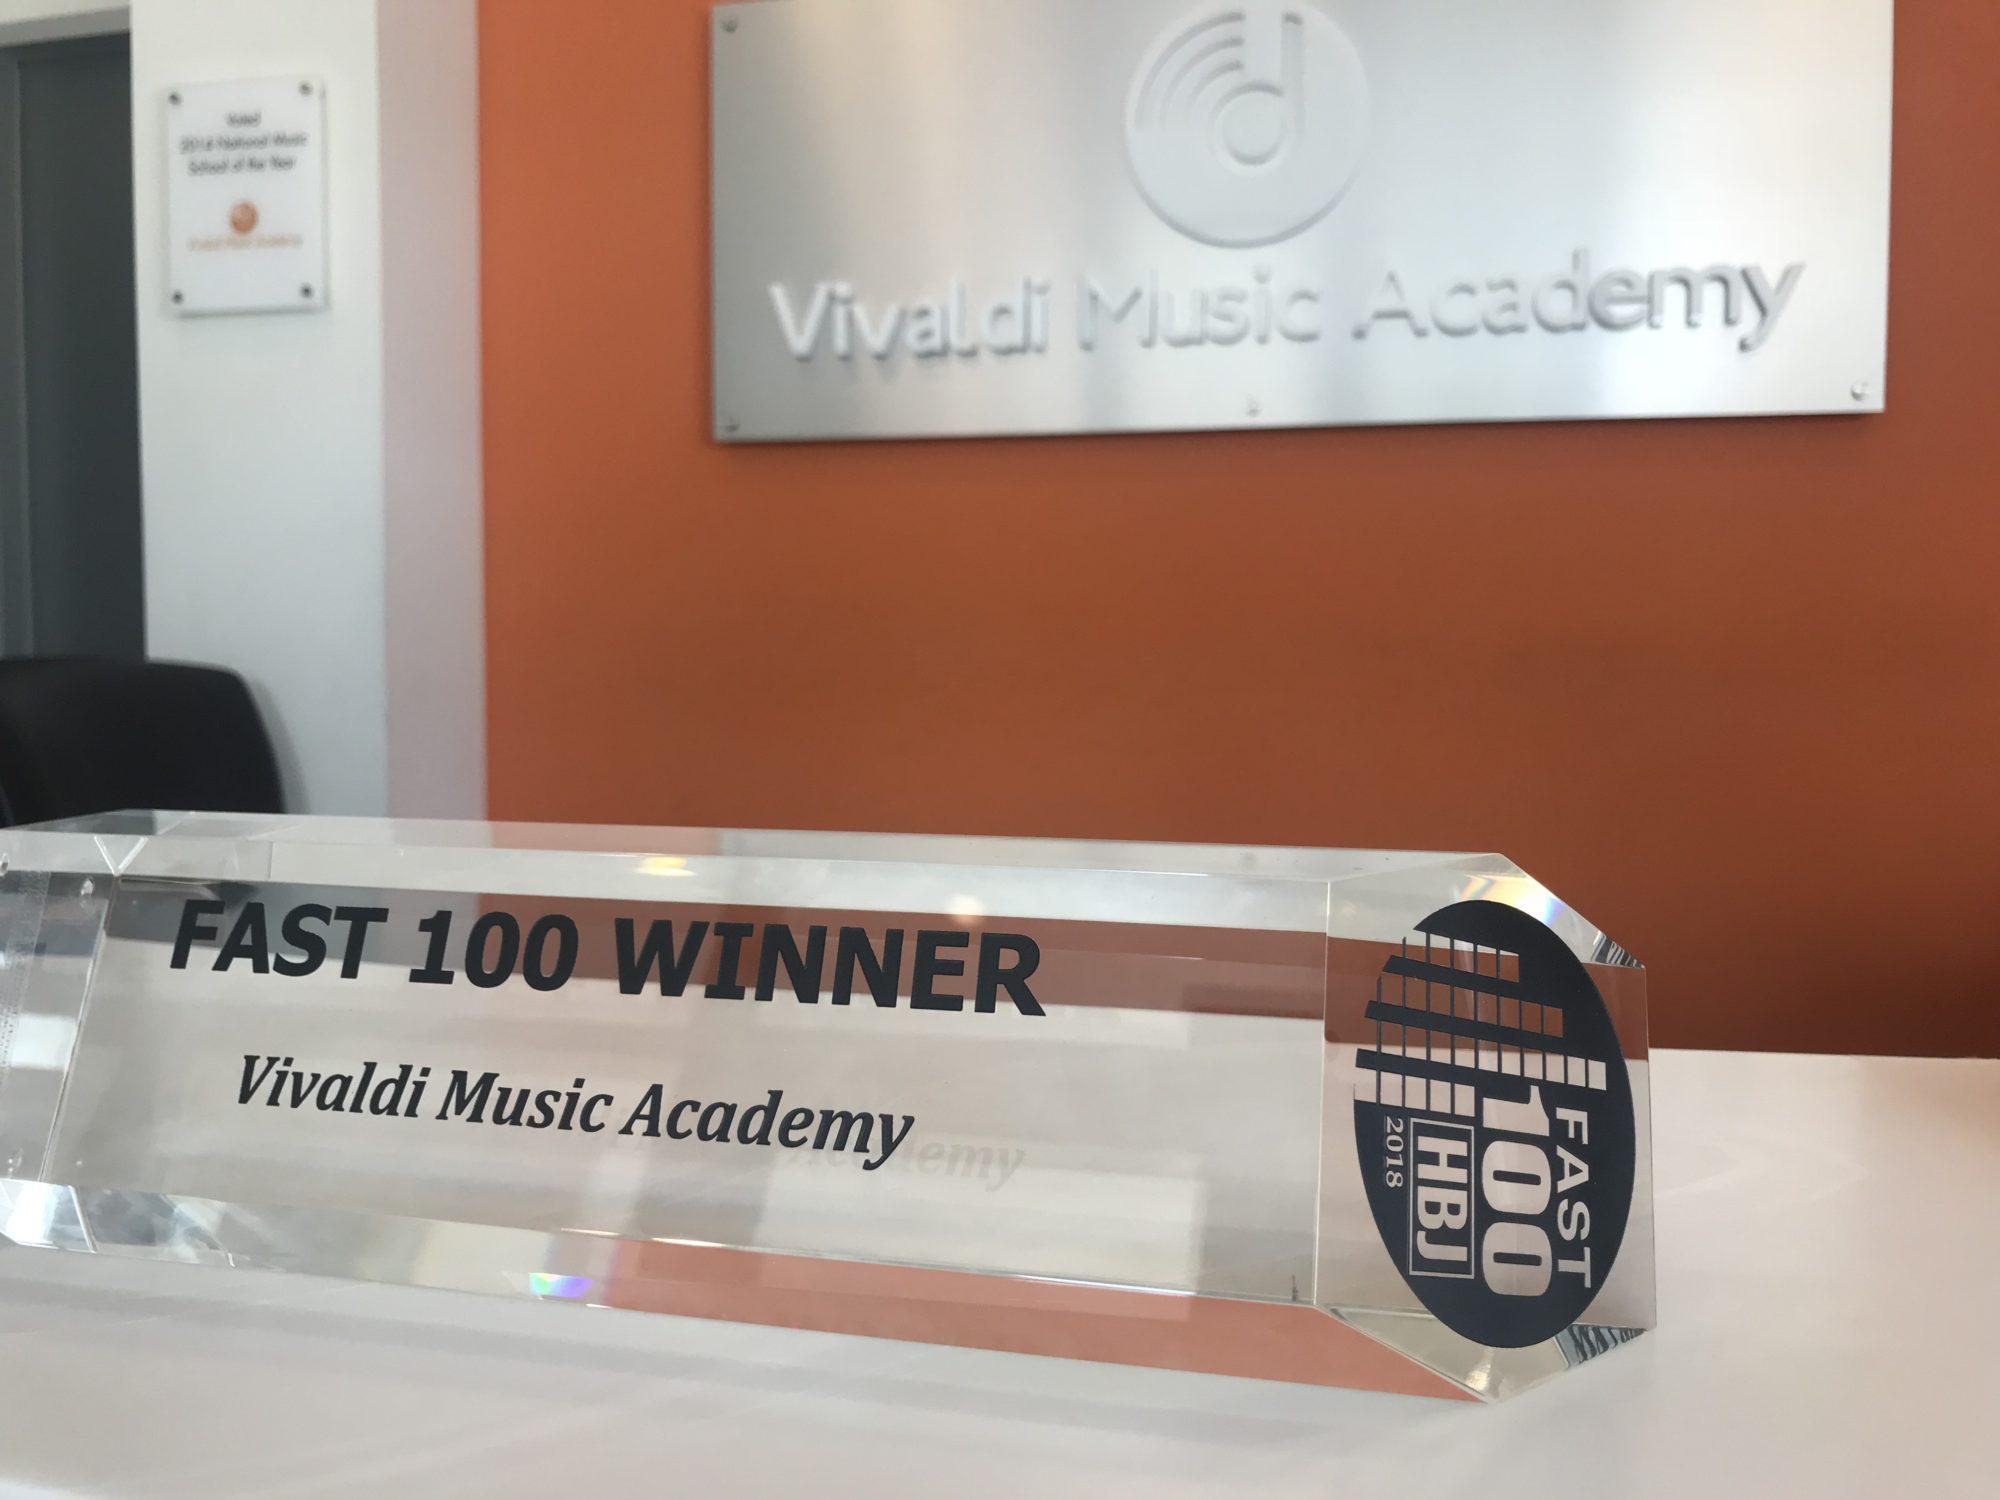 Fast 100 - 2018 - Vivaldi Music Academy